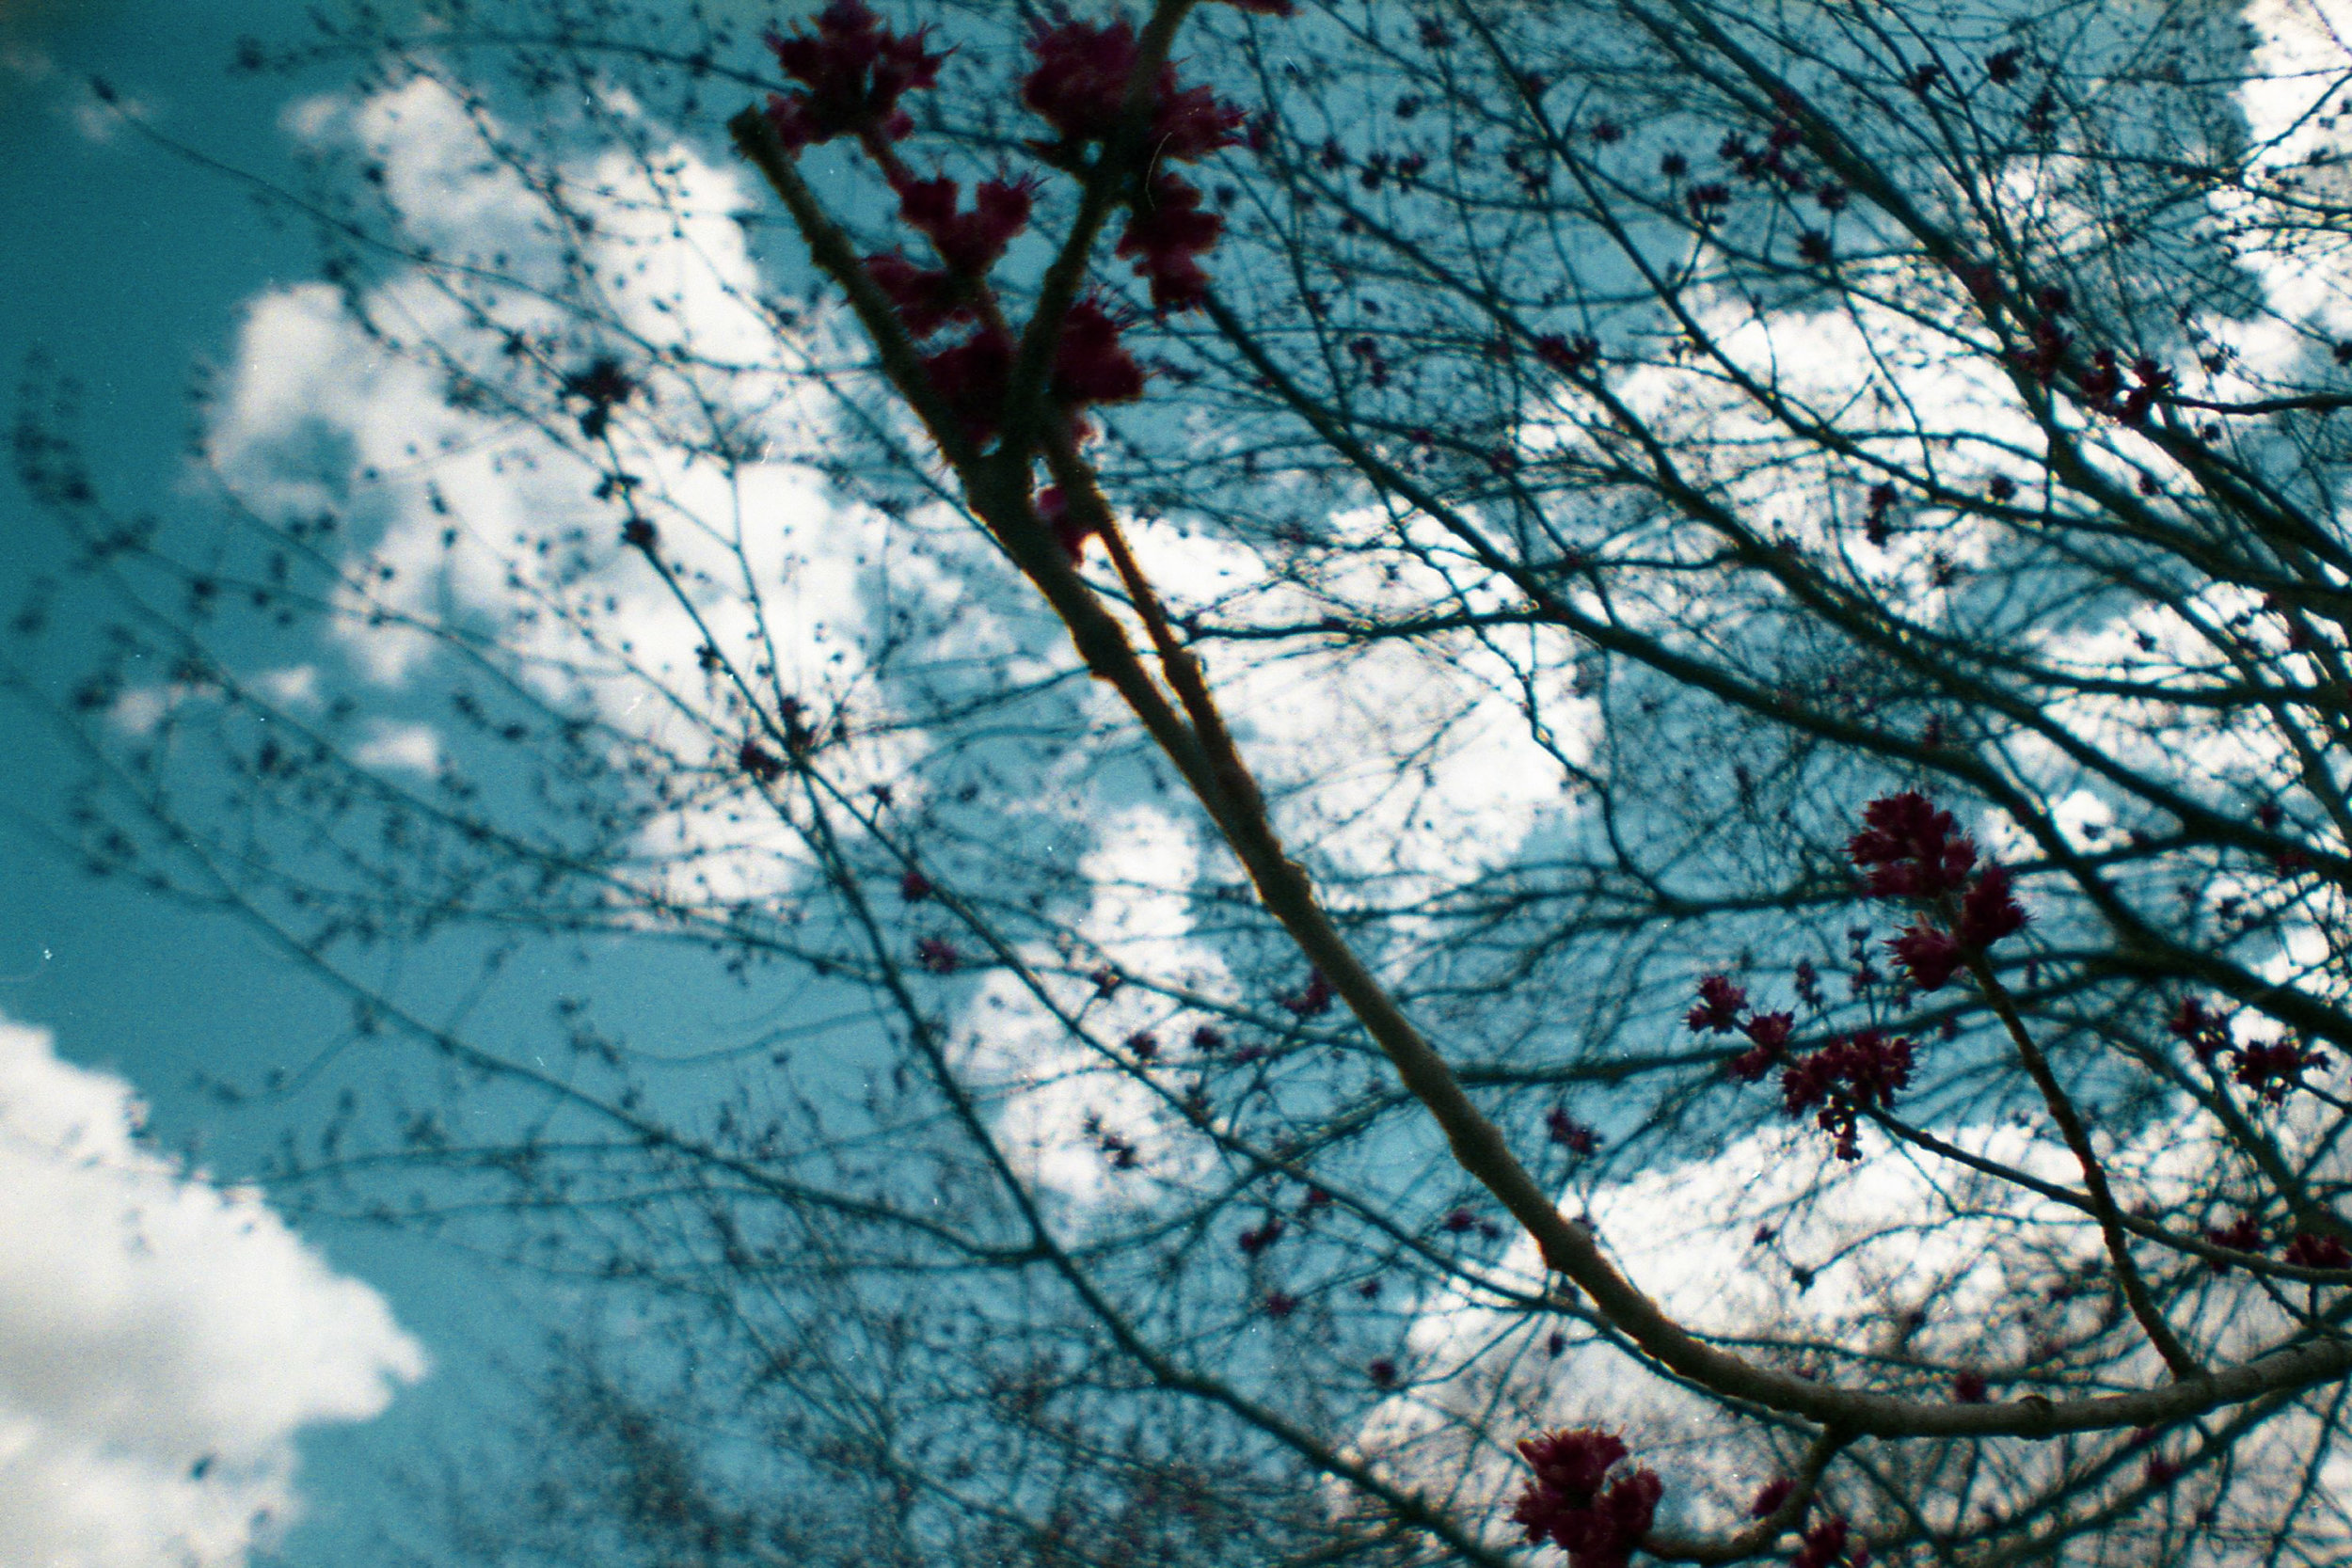 35mm_Edit_025.jpg